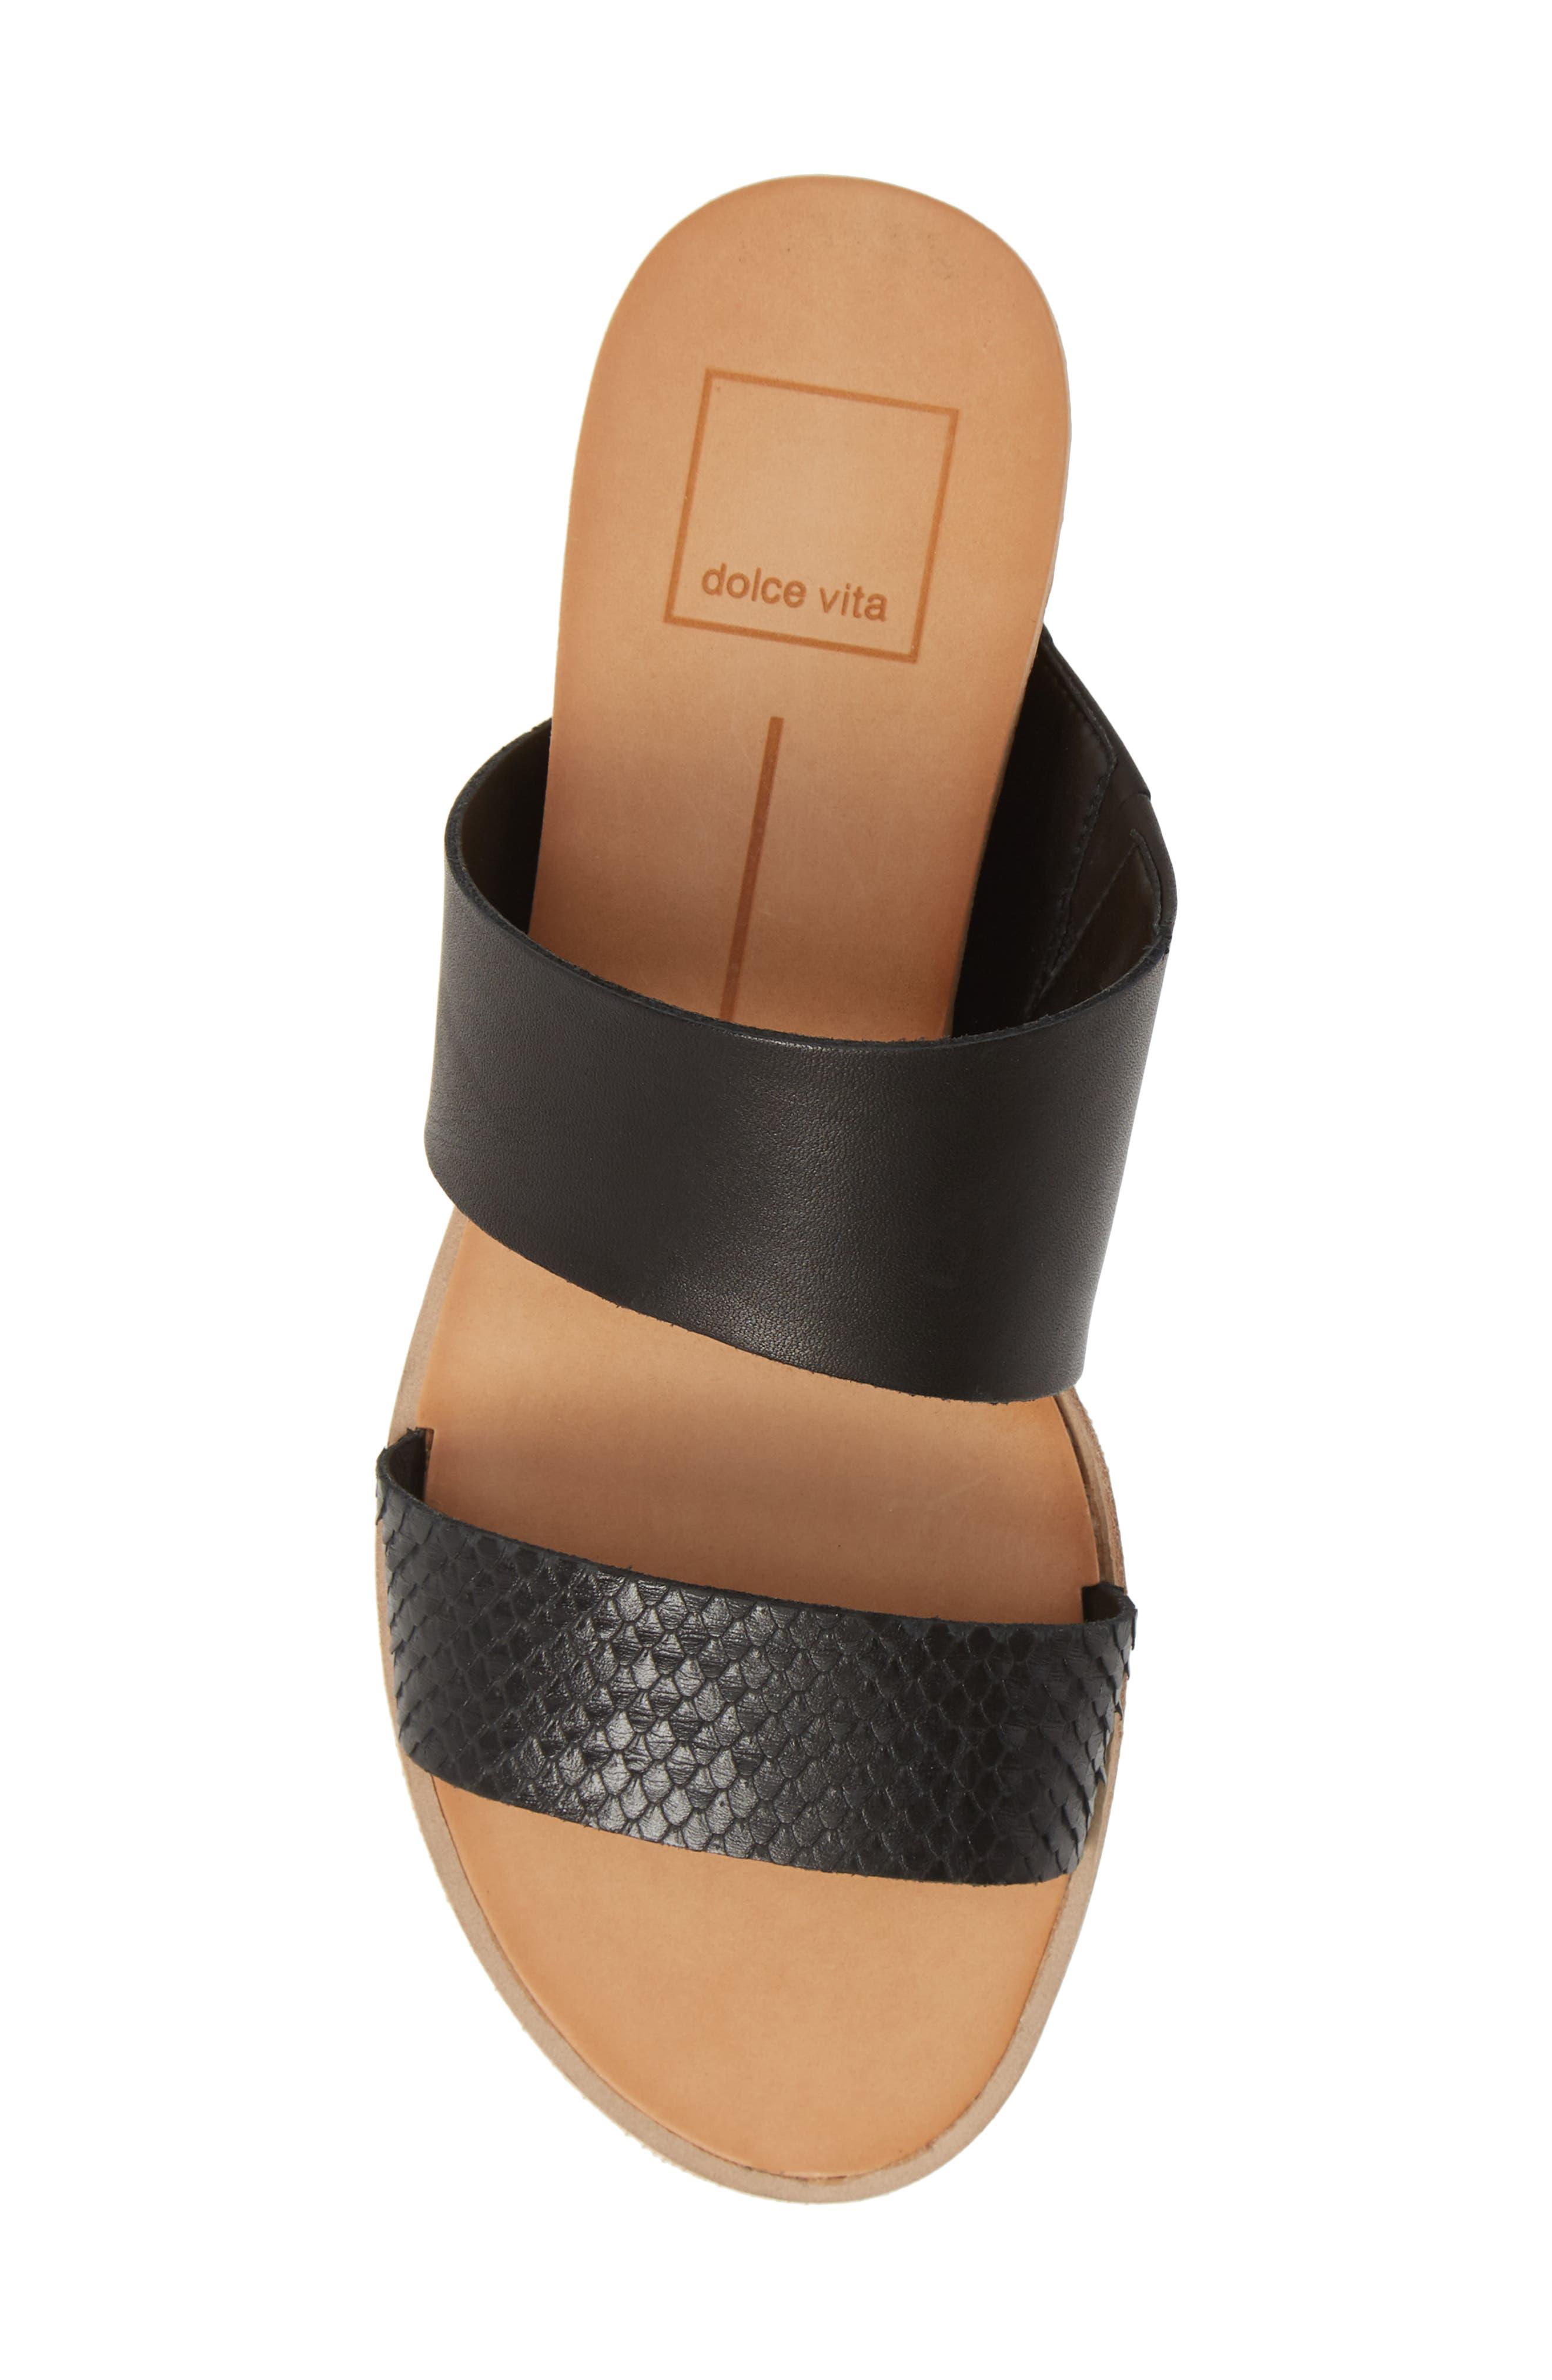 DOLCE VITA, Vala Wedge Slide Sandal, Alternate thumbnail 5, color, BLACK LEATHER